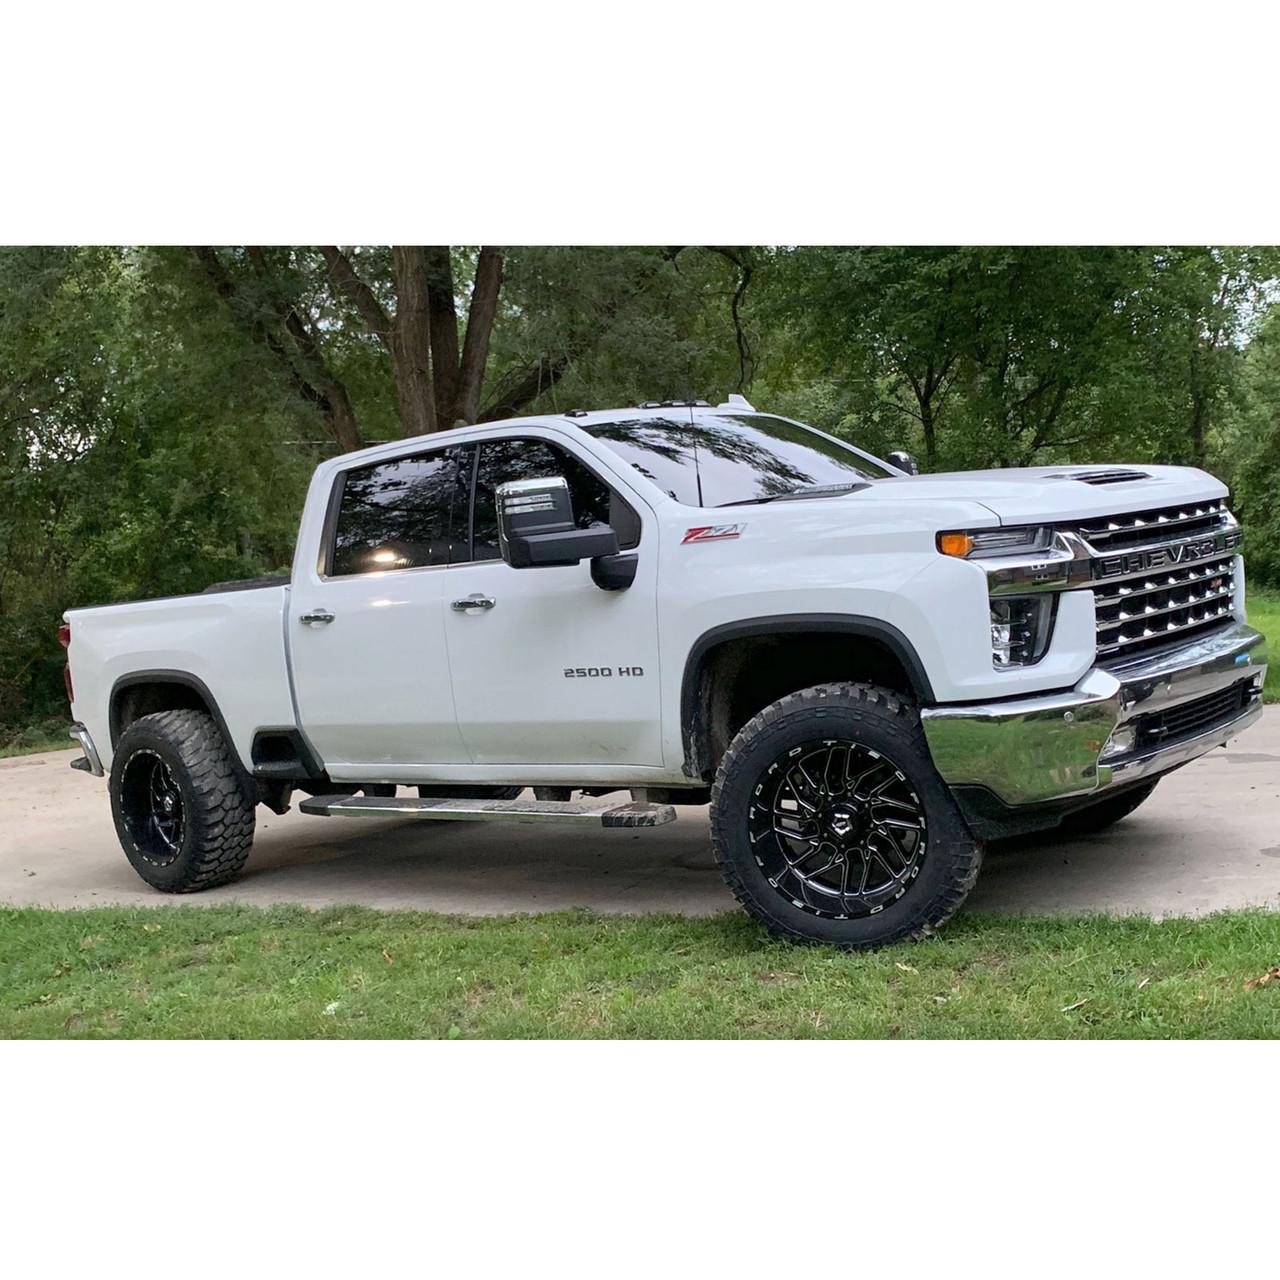 "SMX-MC9 - 2020-2021 Chevrolet Silverado & GMC Sierra 2500 3500 4X4 2.5"" Front Torsion Bar Key Lift Leveling Kit Installed"